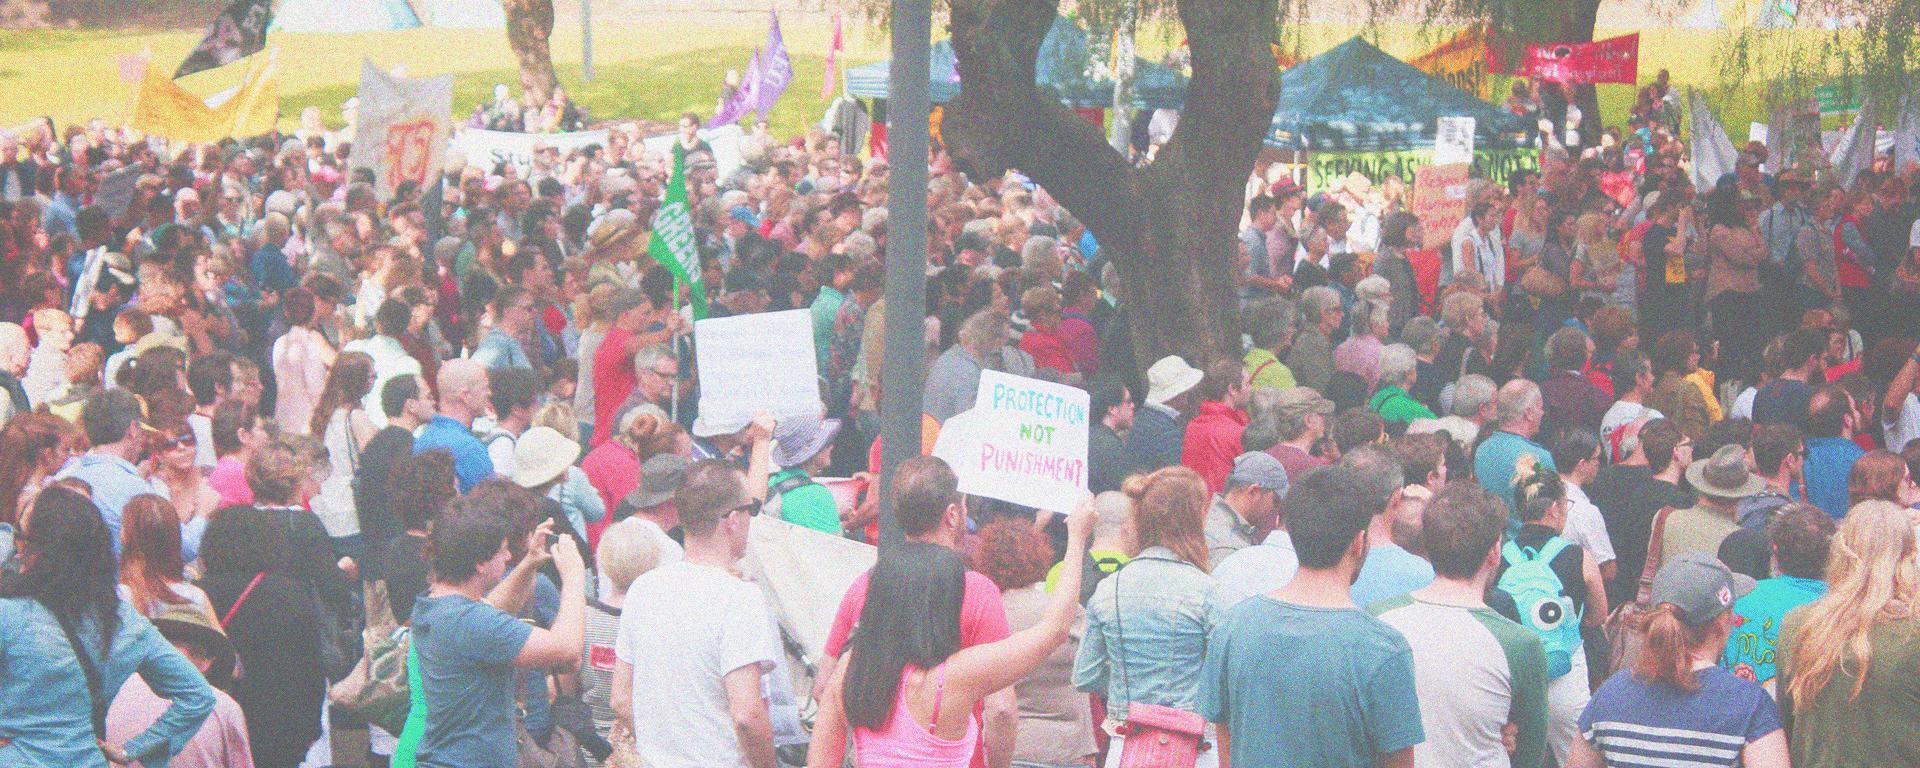 sydney rally isabelle whitington